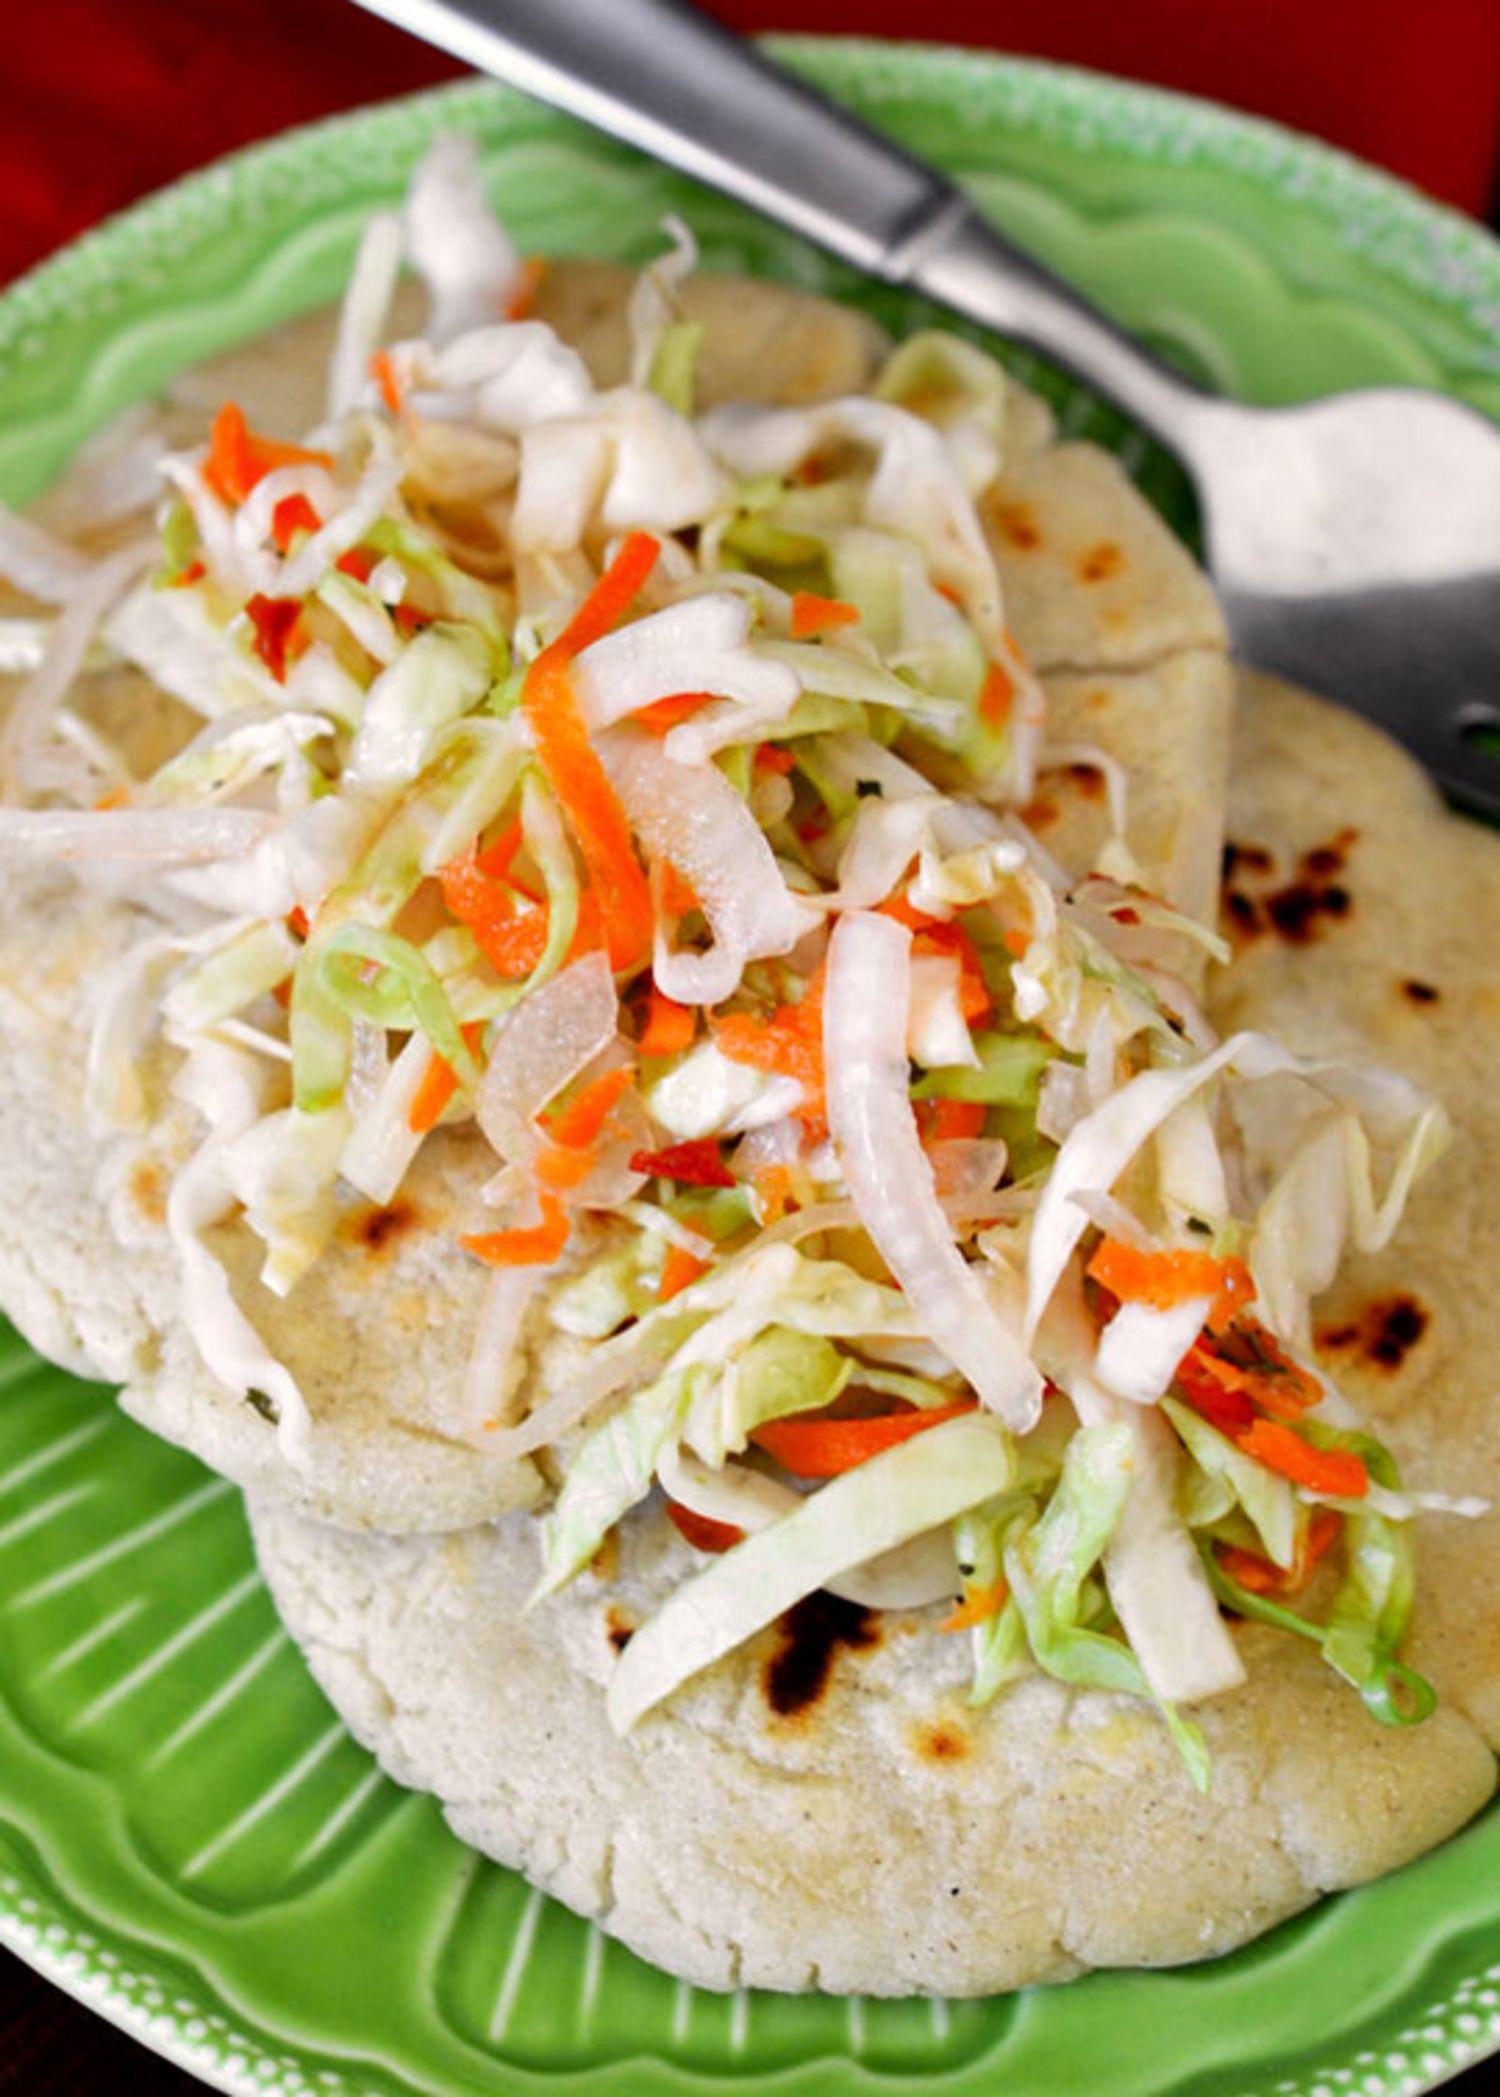 how to make vegetarian pupusas